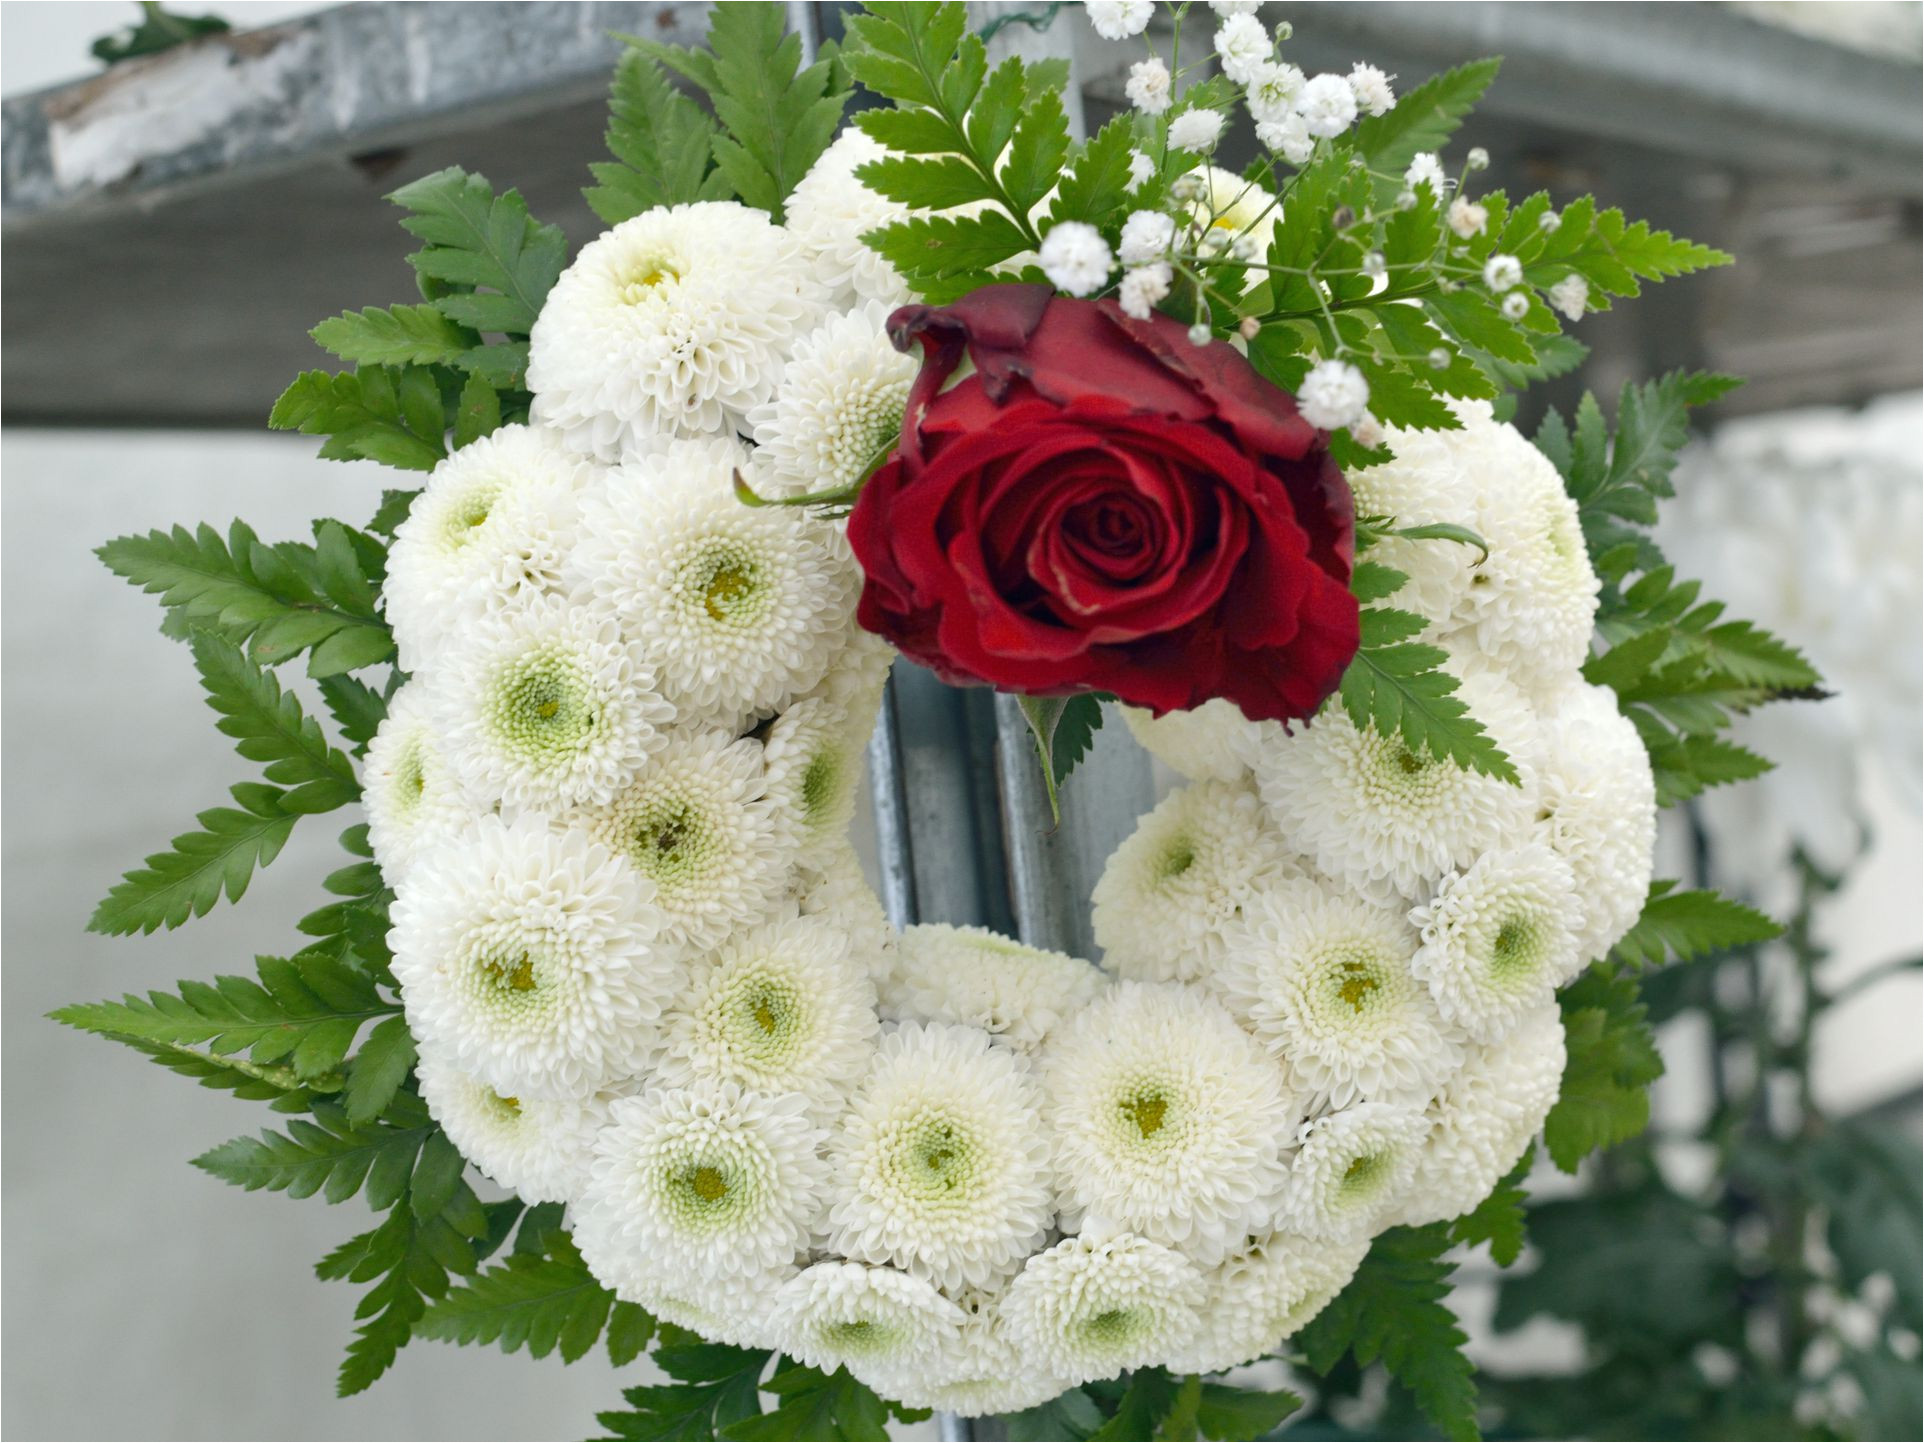 funeralwreath gettyimages 591655301 5a3edccc5b6e240037ffc773 jpg